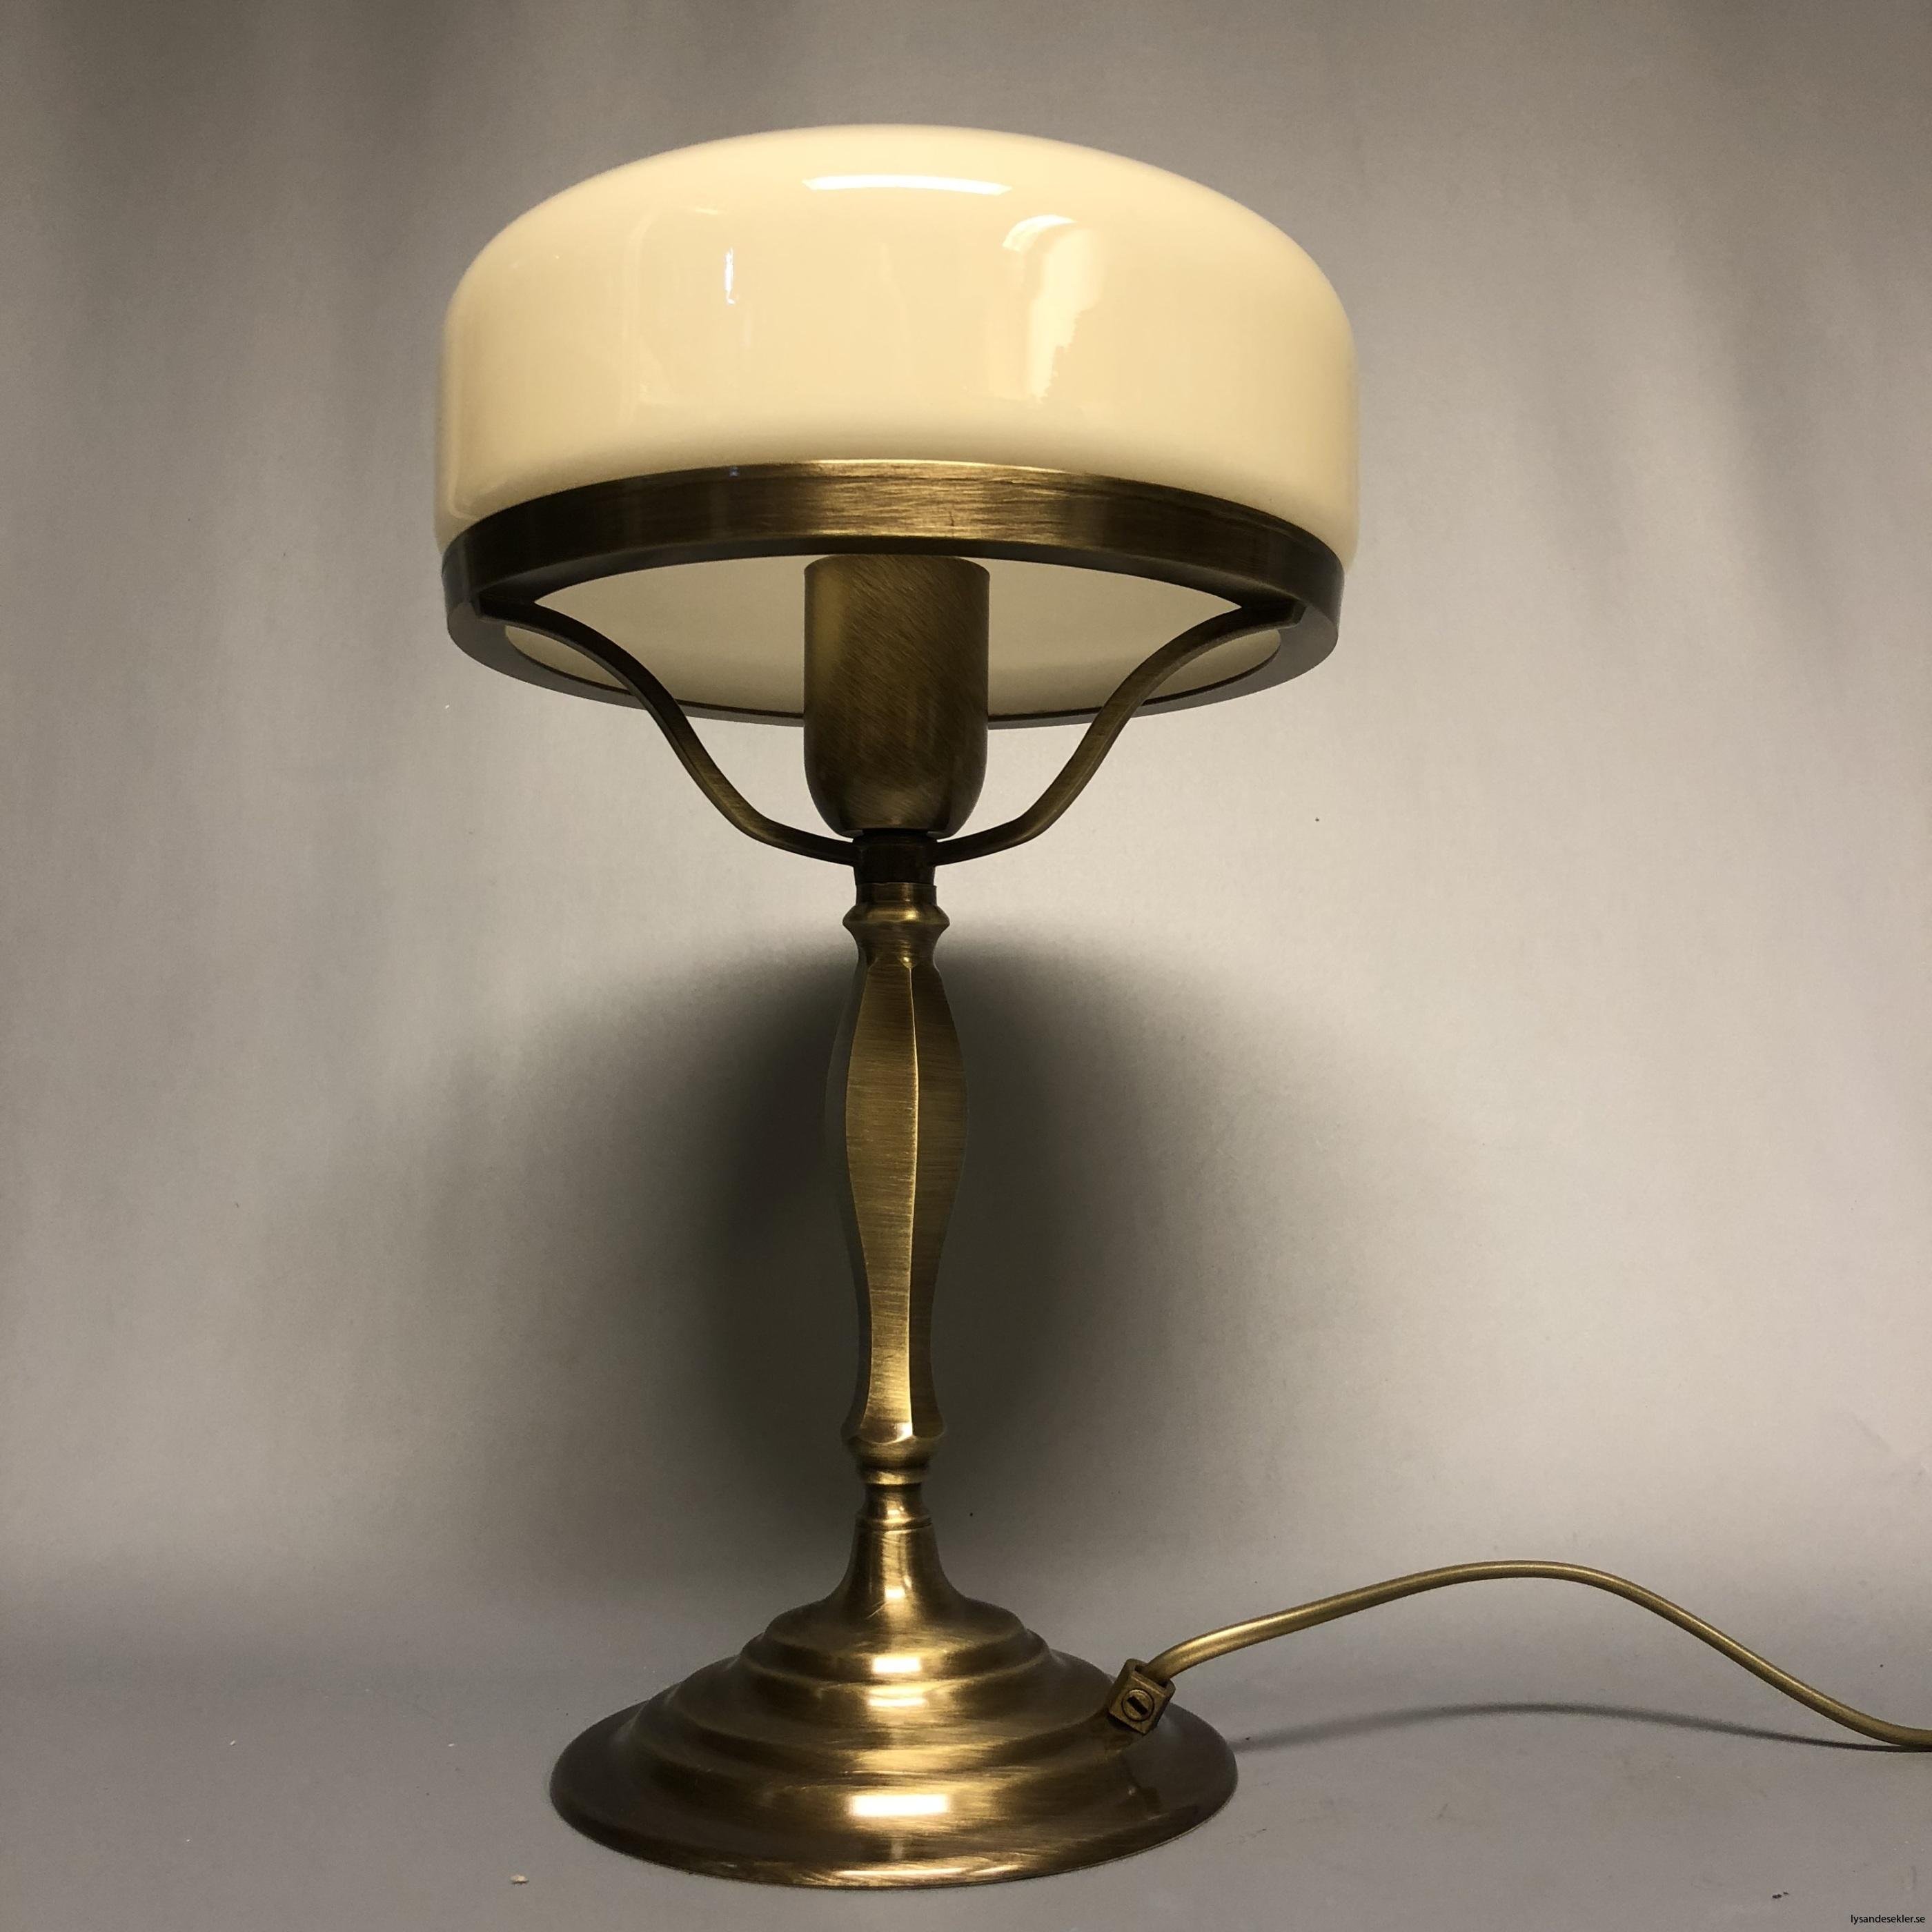 strindbergslampa strindbergslampor strindberg lampa skärm kupa strindbergsskärm strindbergskupa42